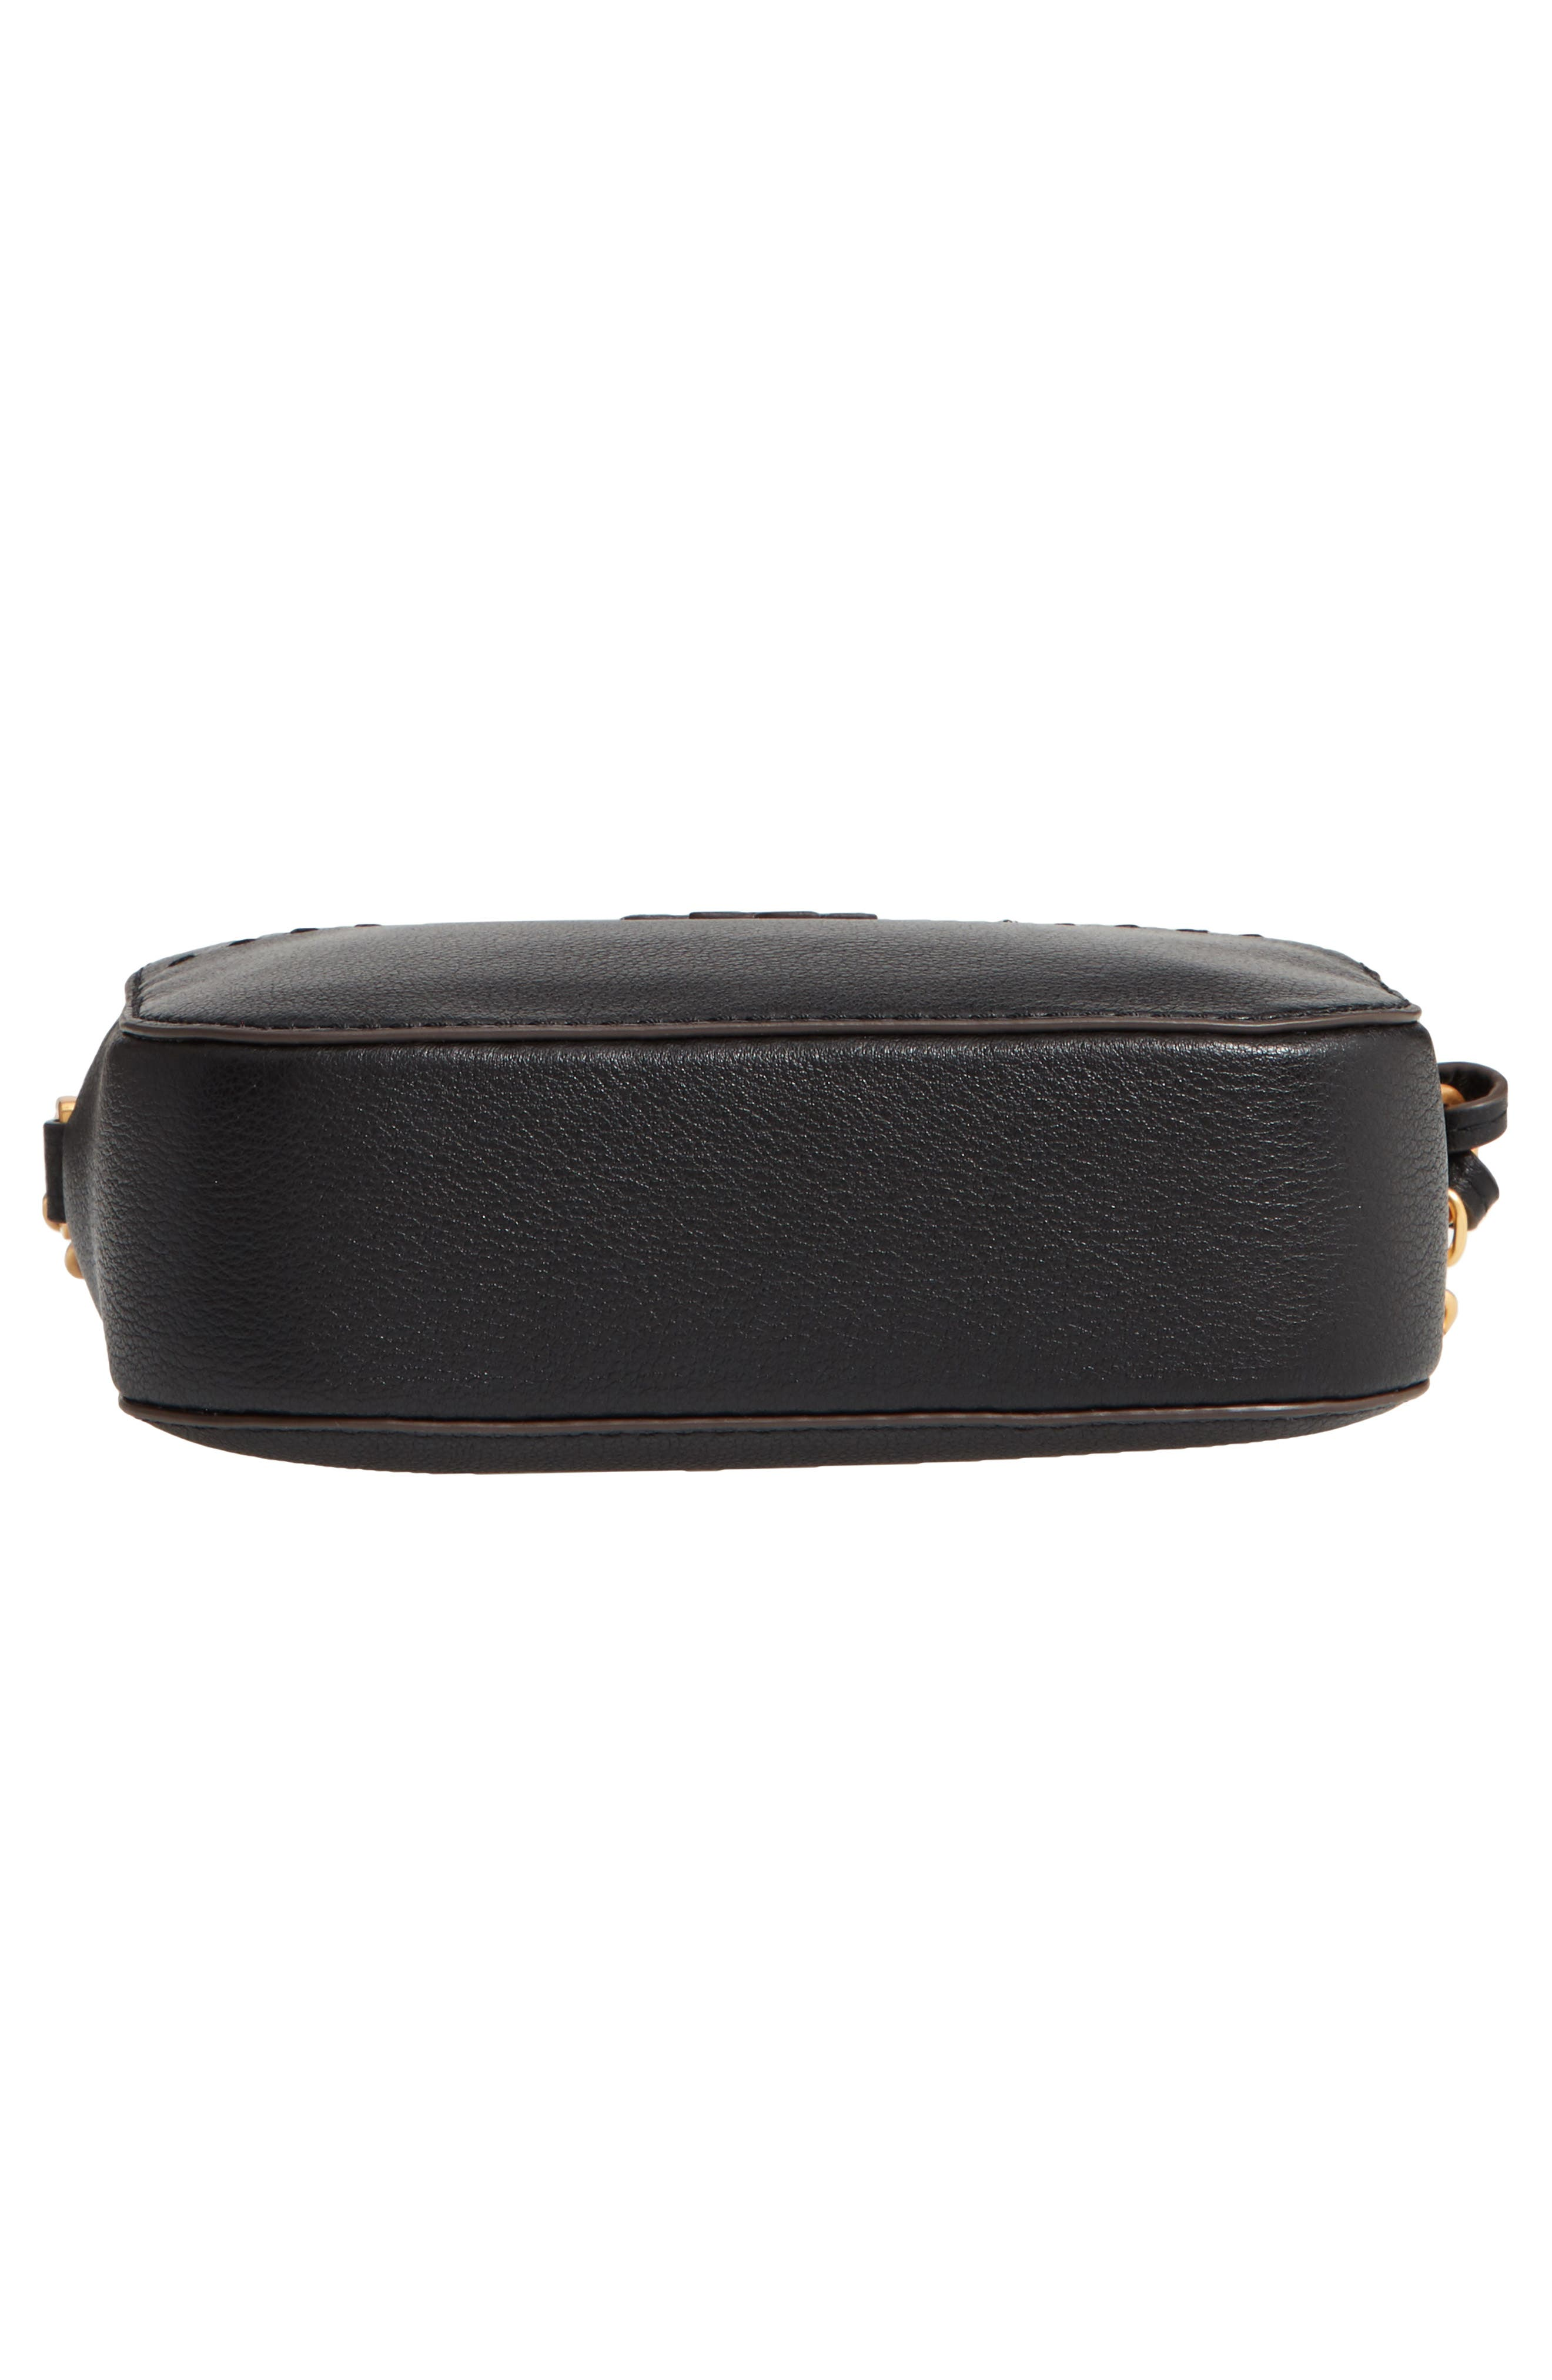 McGraw Leather Camera Bag,                             Alternate thumbnail 6, color,                             BLACK